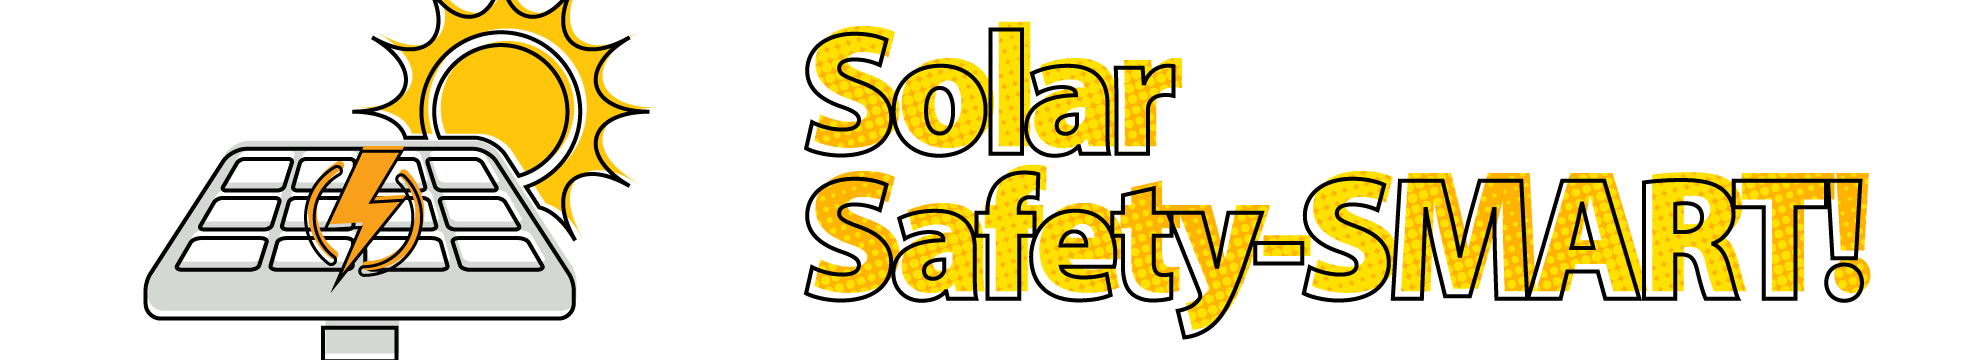 66910 Solar Safety SMART subpage bnr 1970x360